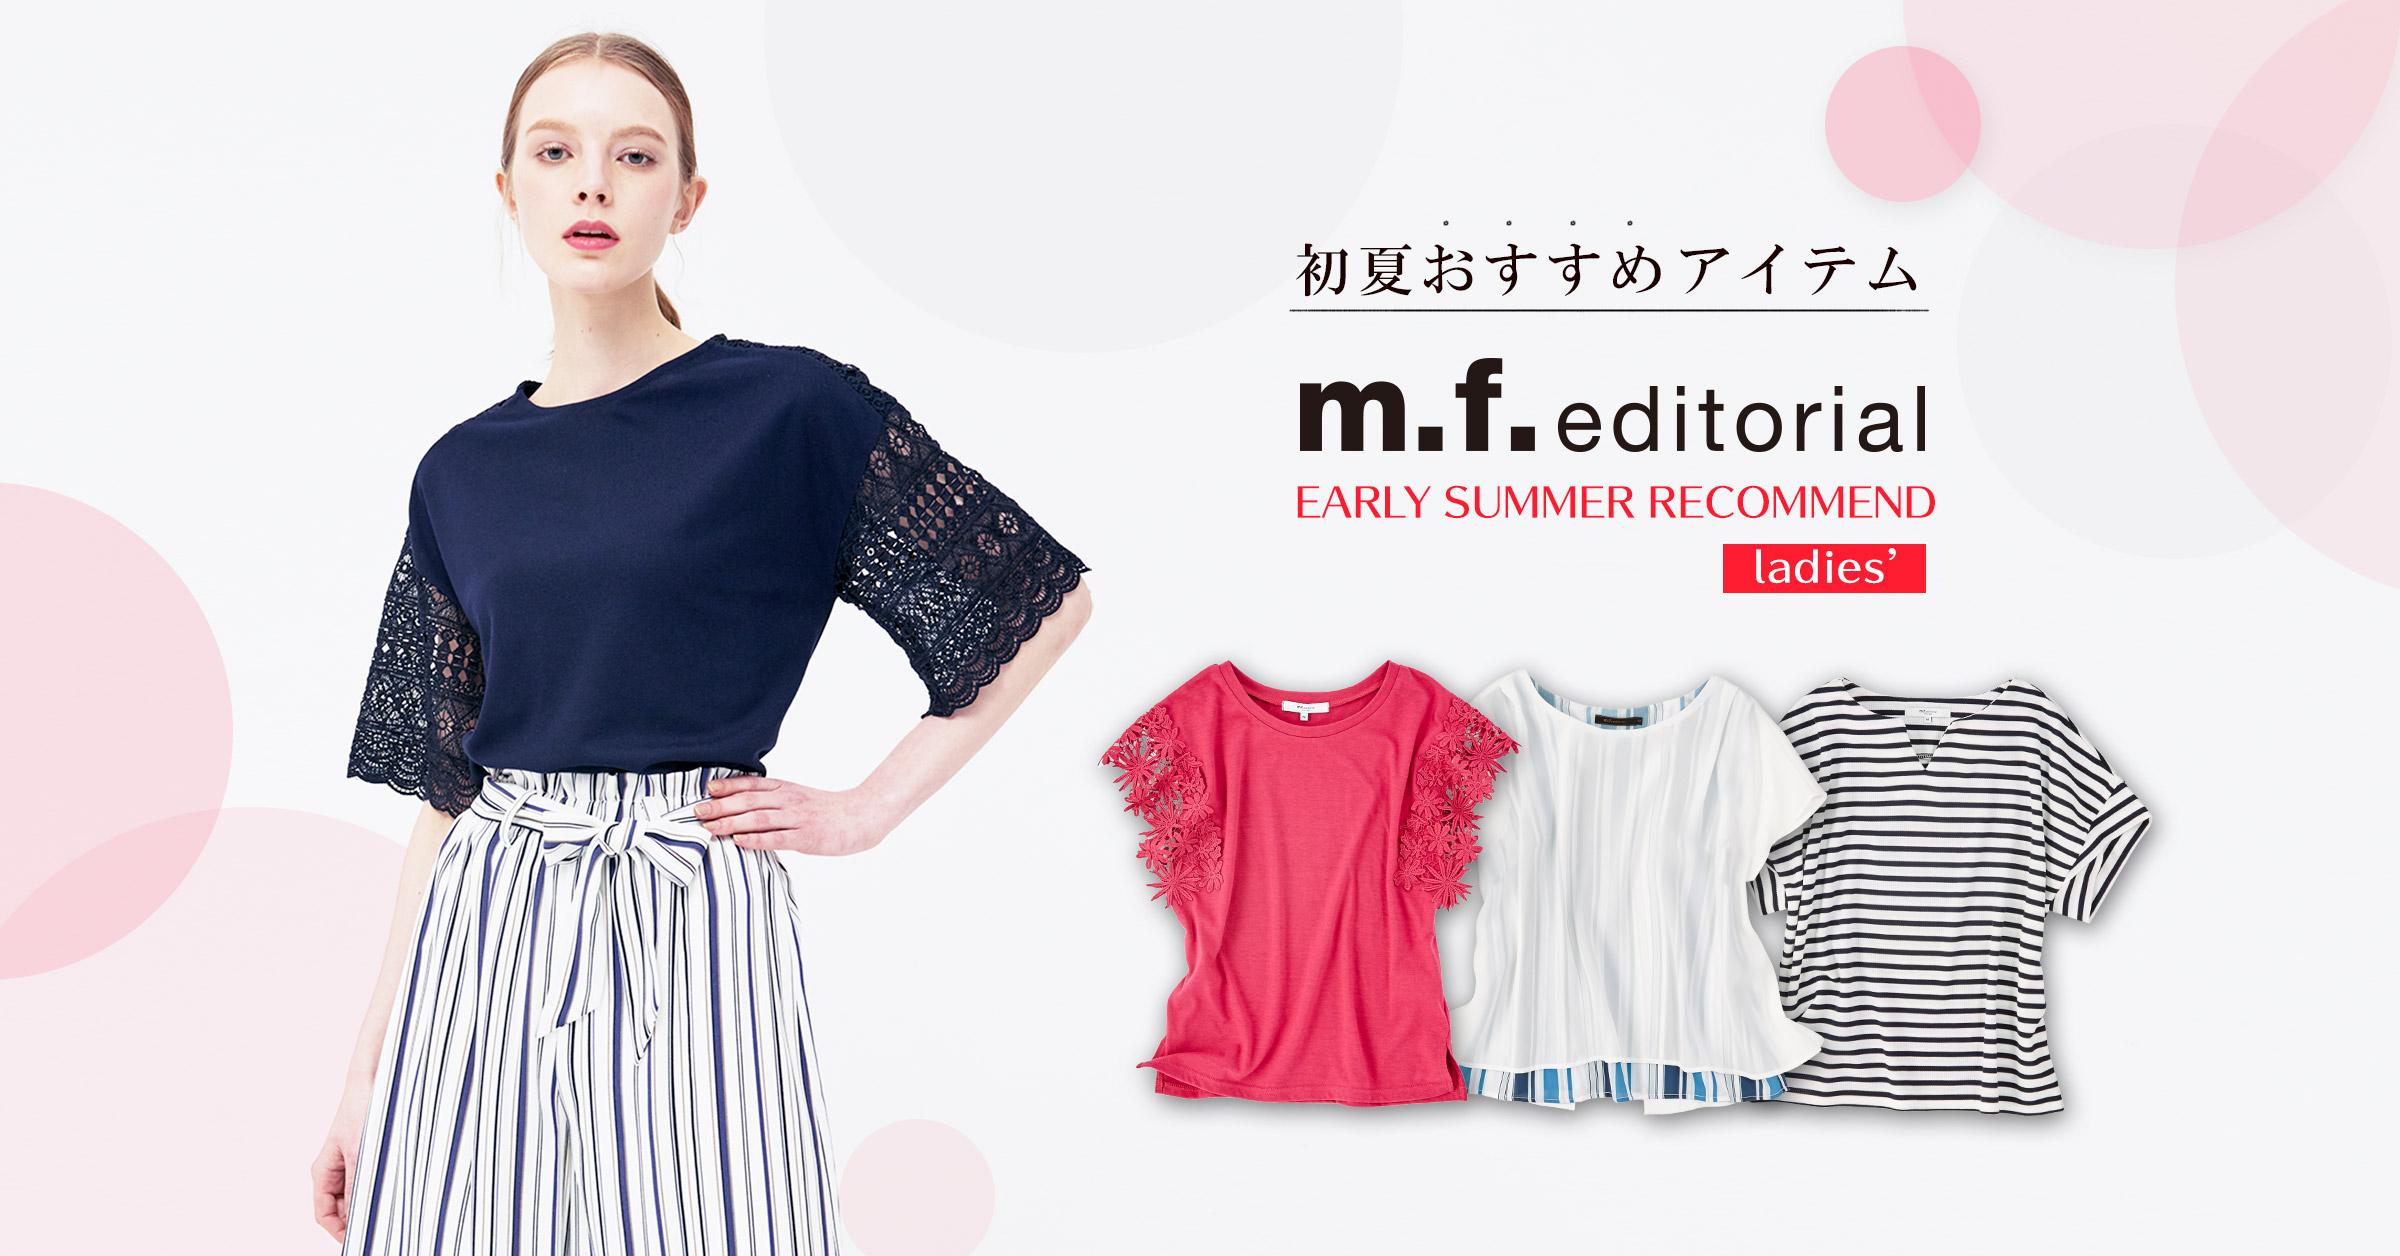 m.f.editorial 初夏おすすめアイテム for Women